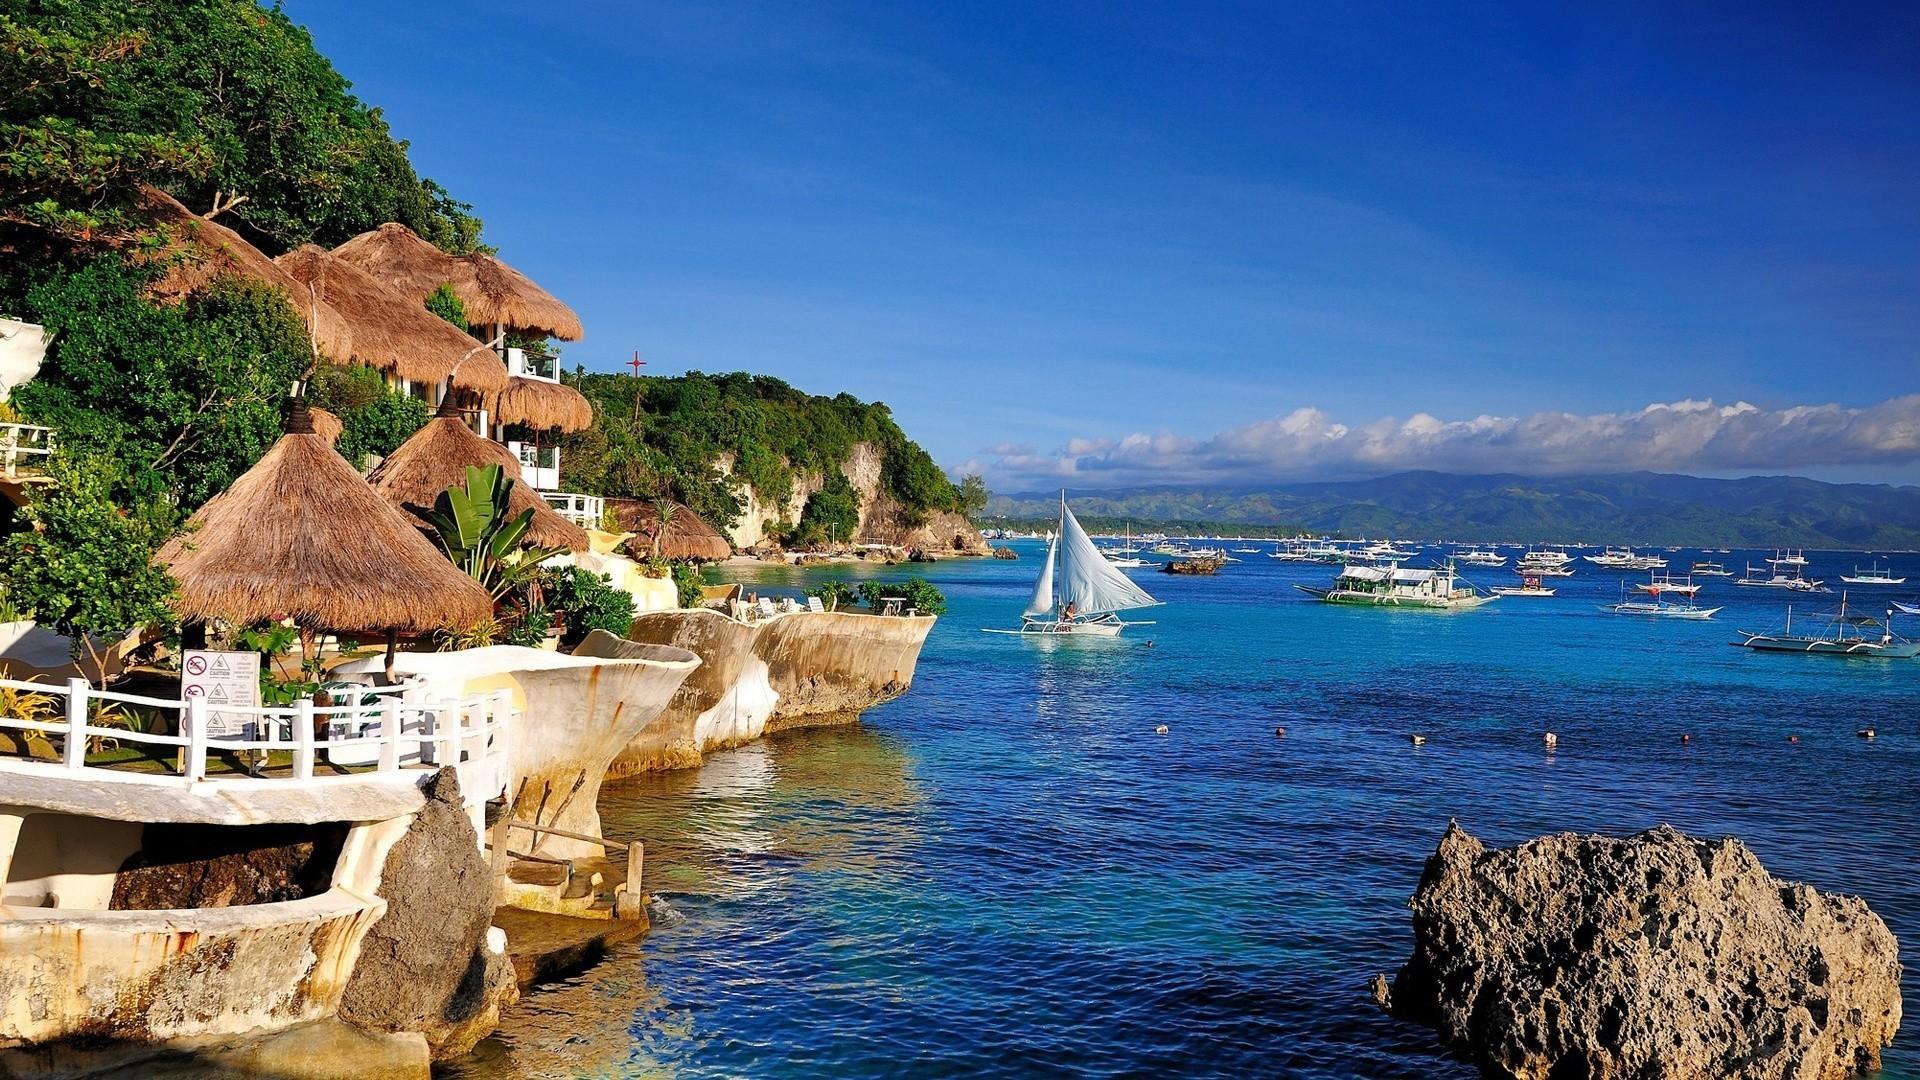 wonderful-seaside-resort-hd-wallpaper-601787.jpg